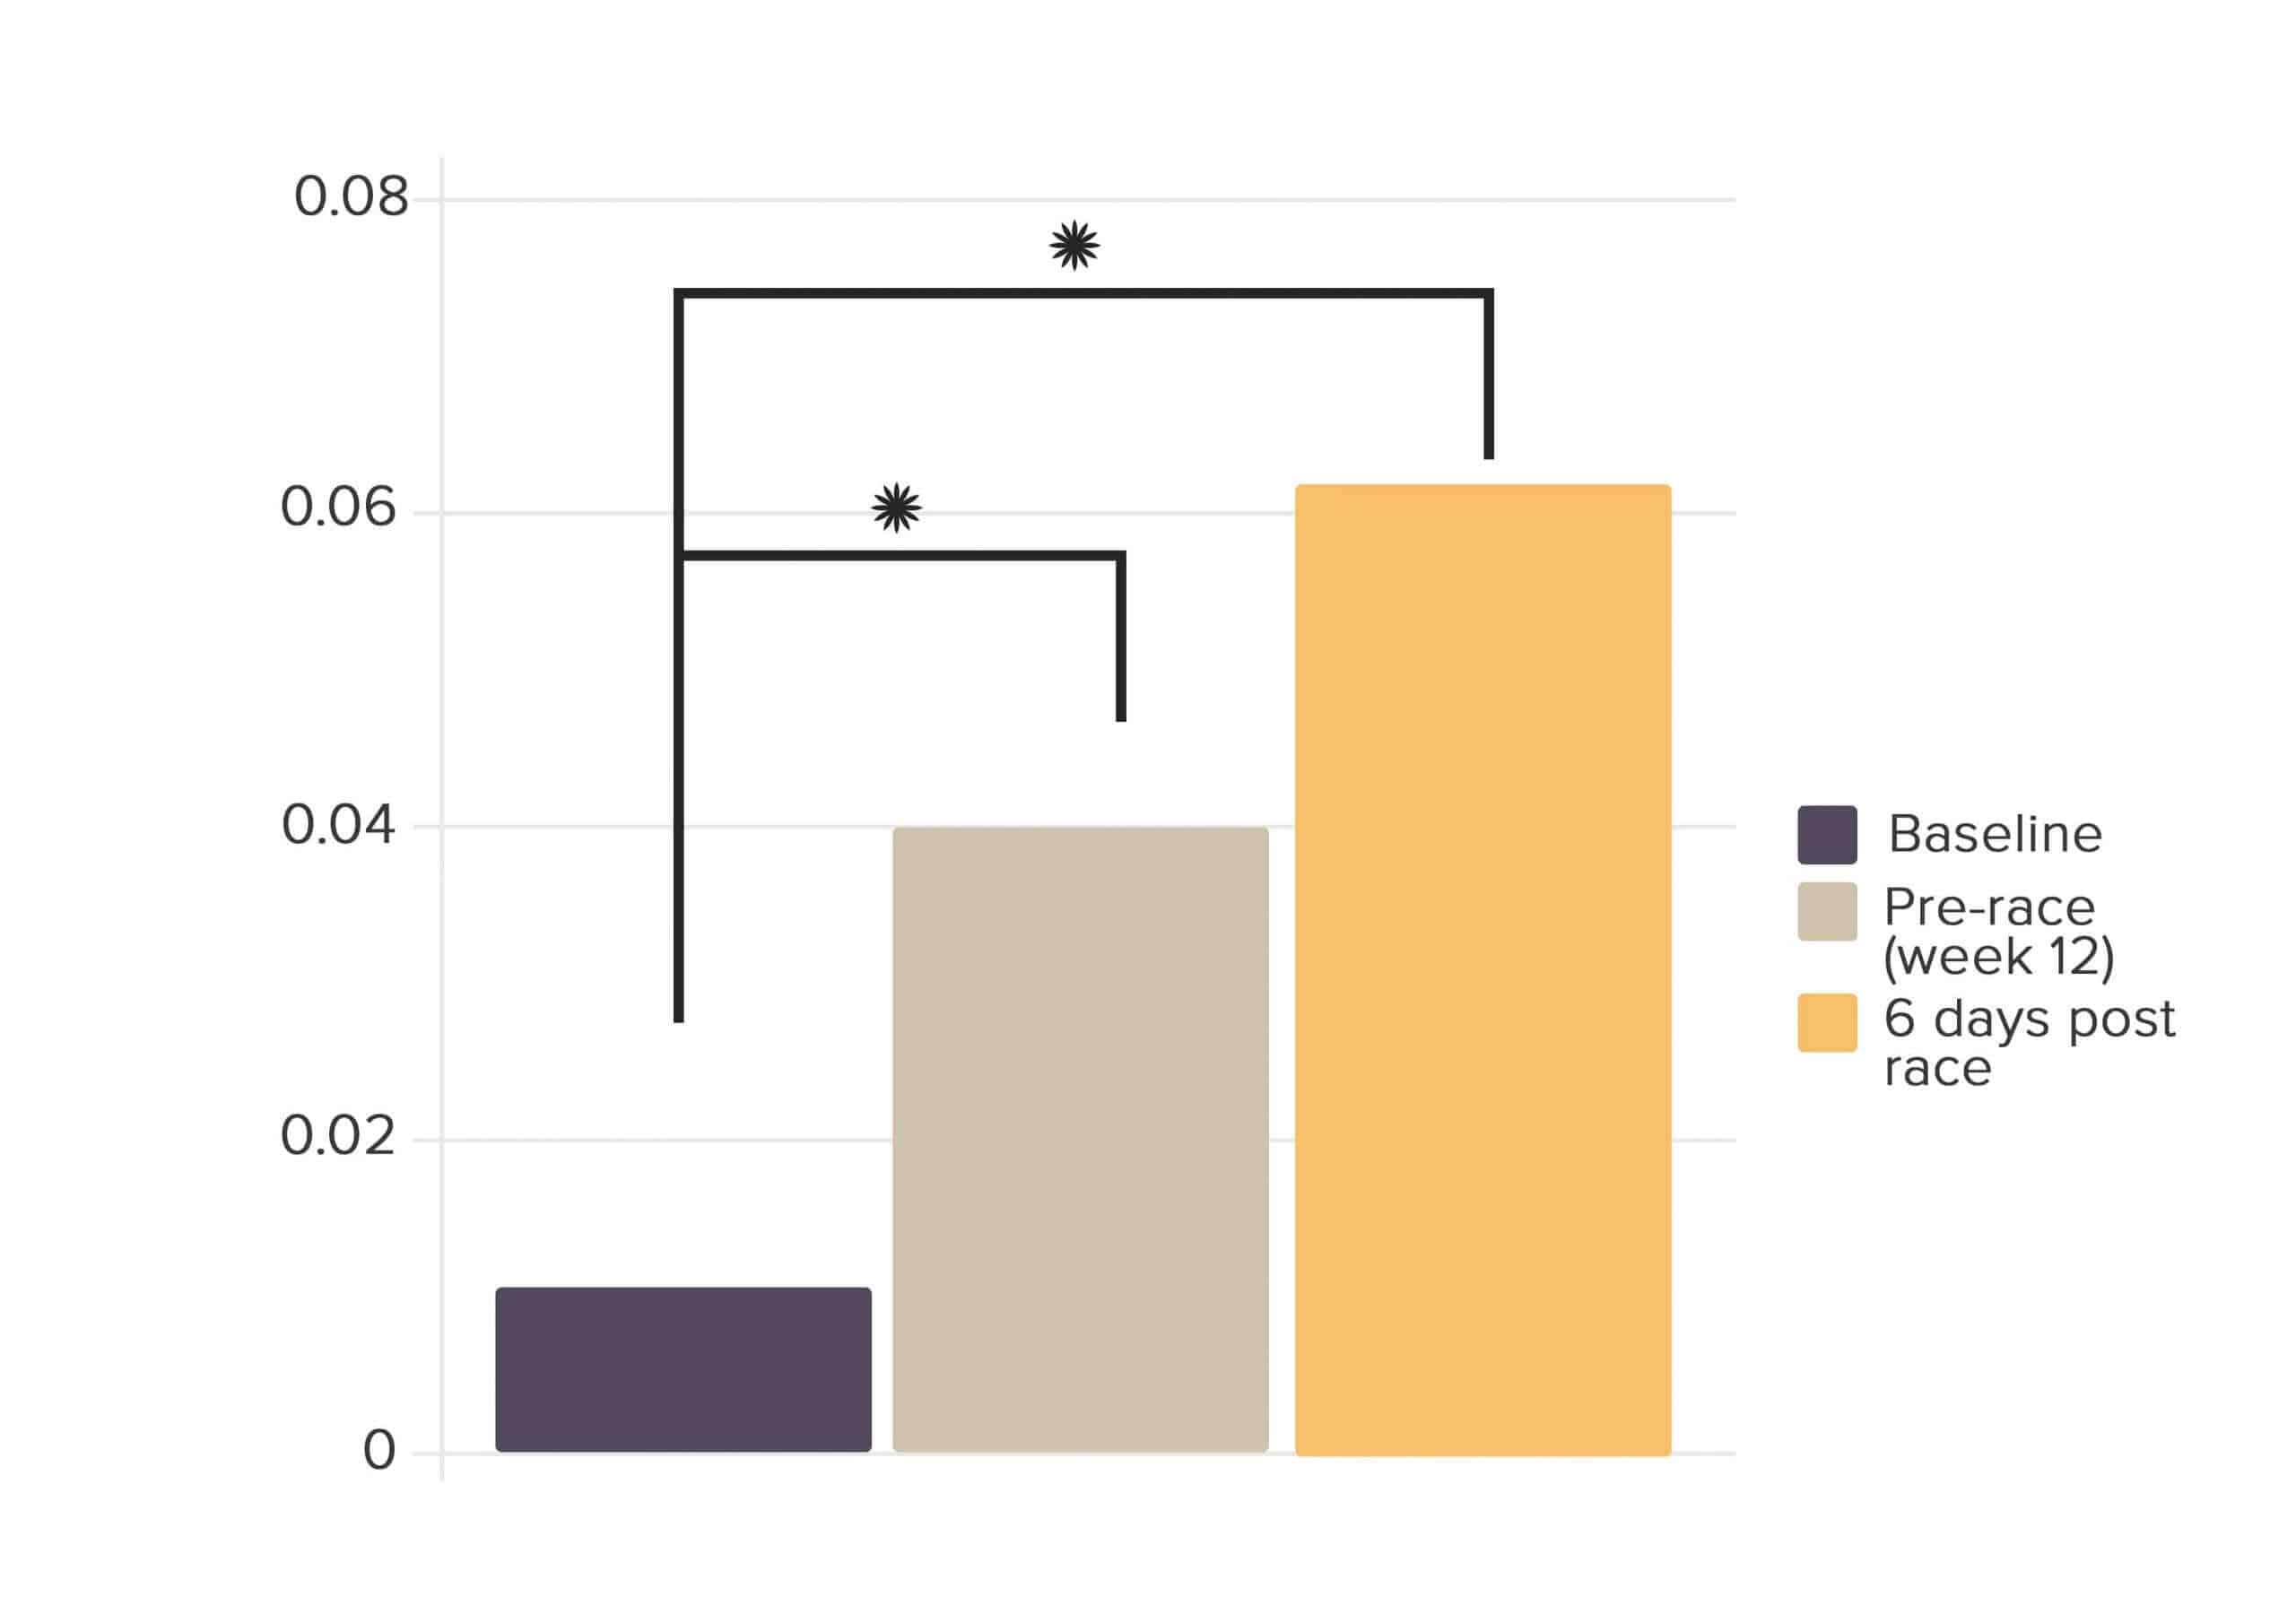 Plasma endotoxin levels (pg/ml)